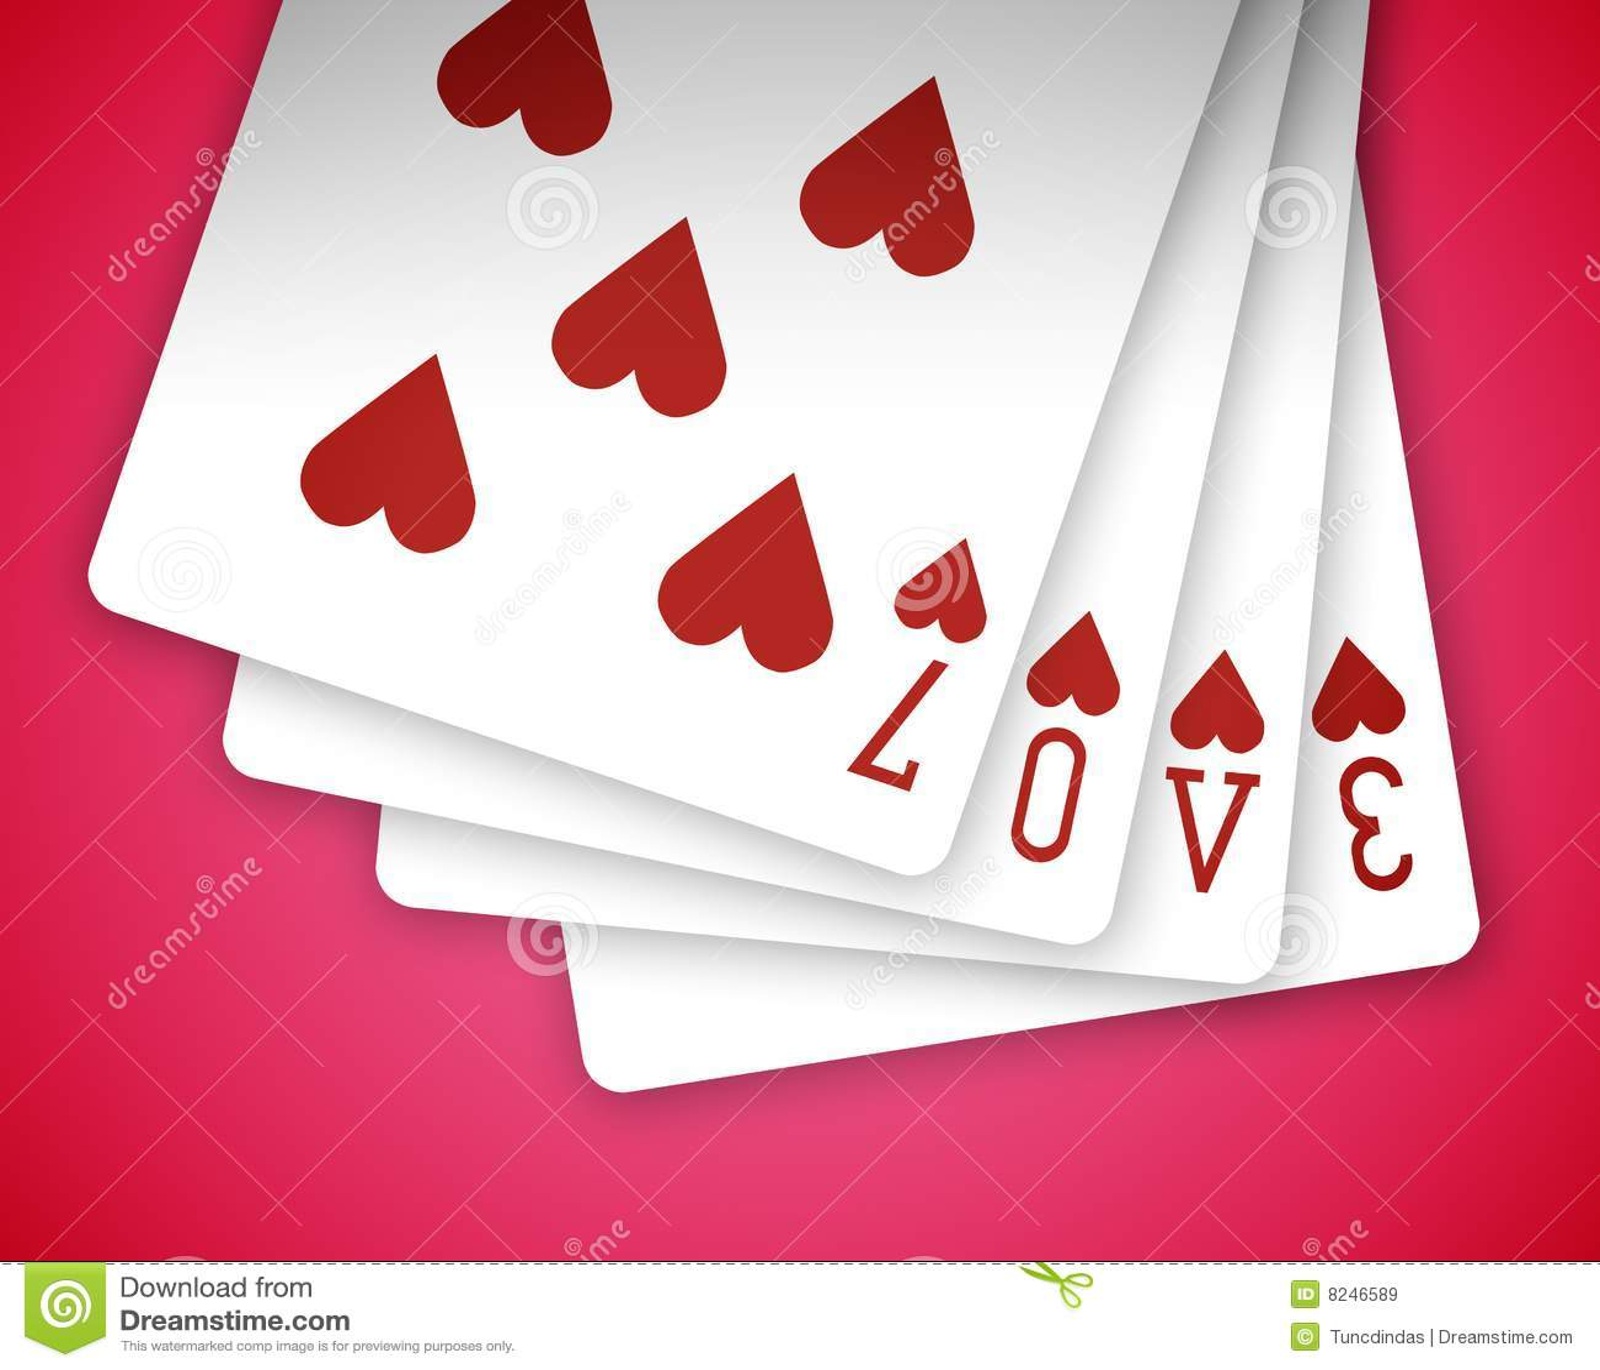 Poker love 02